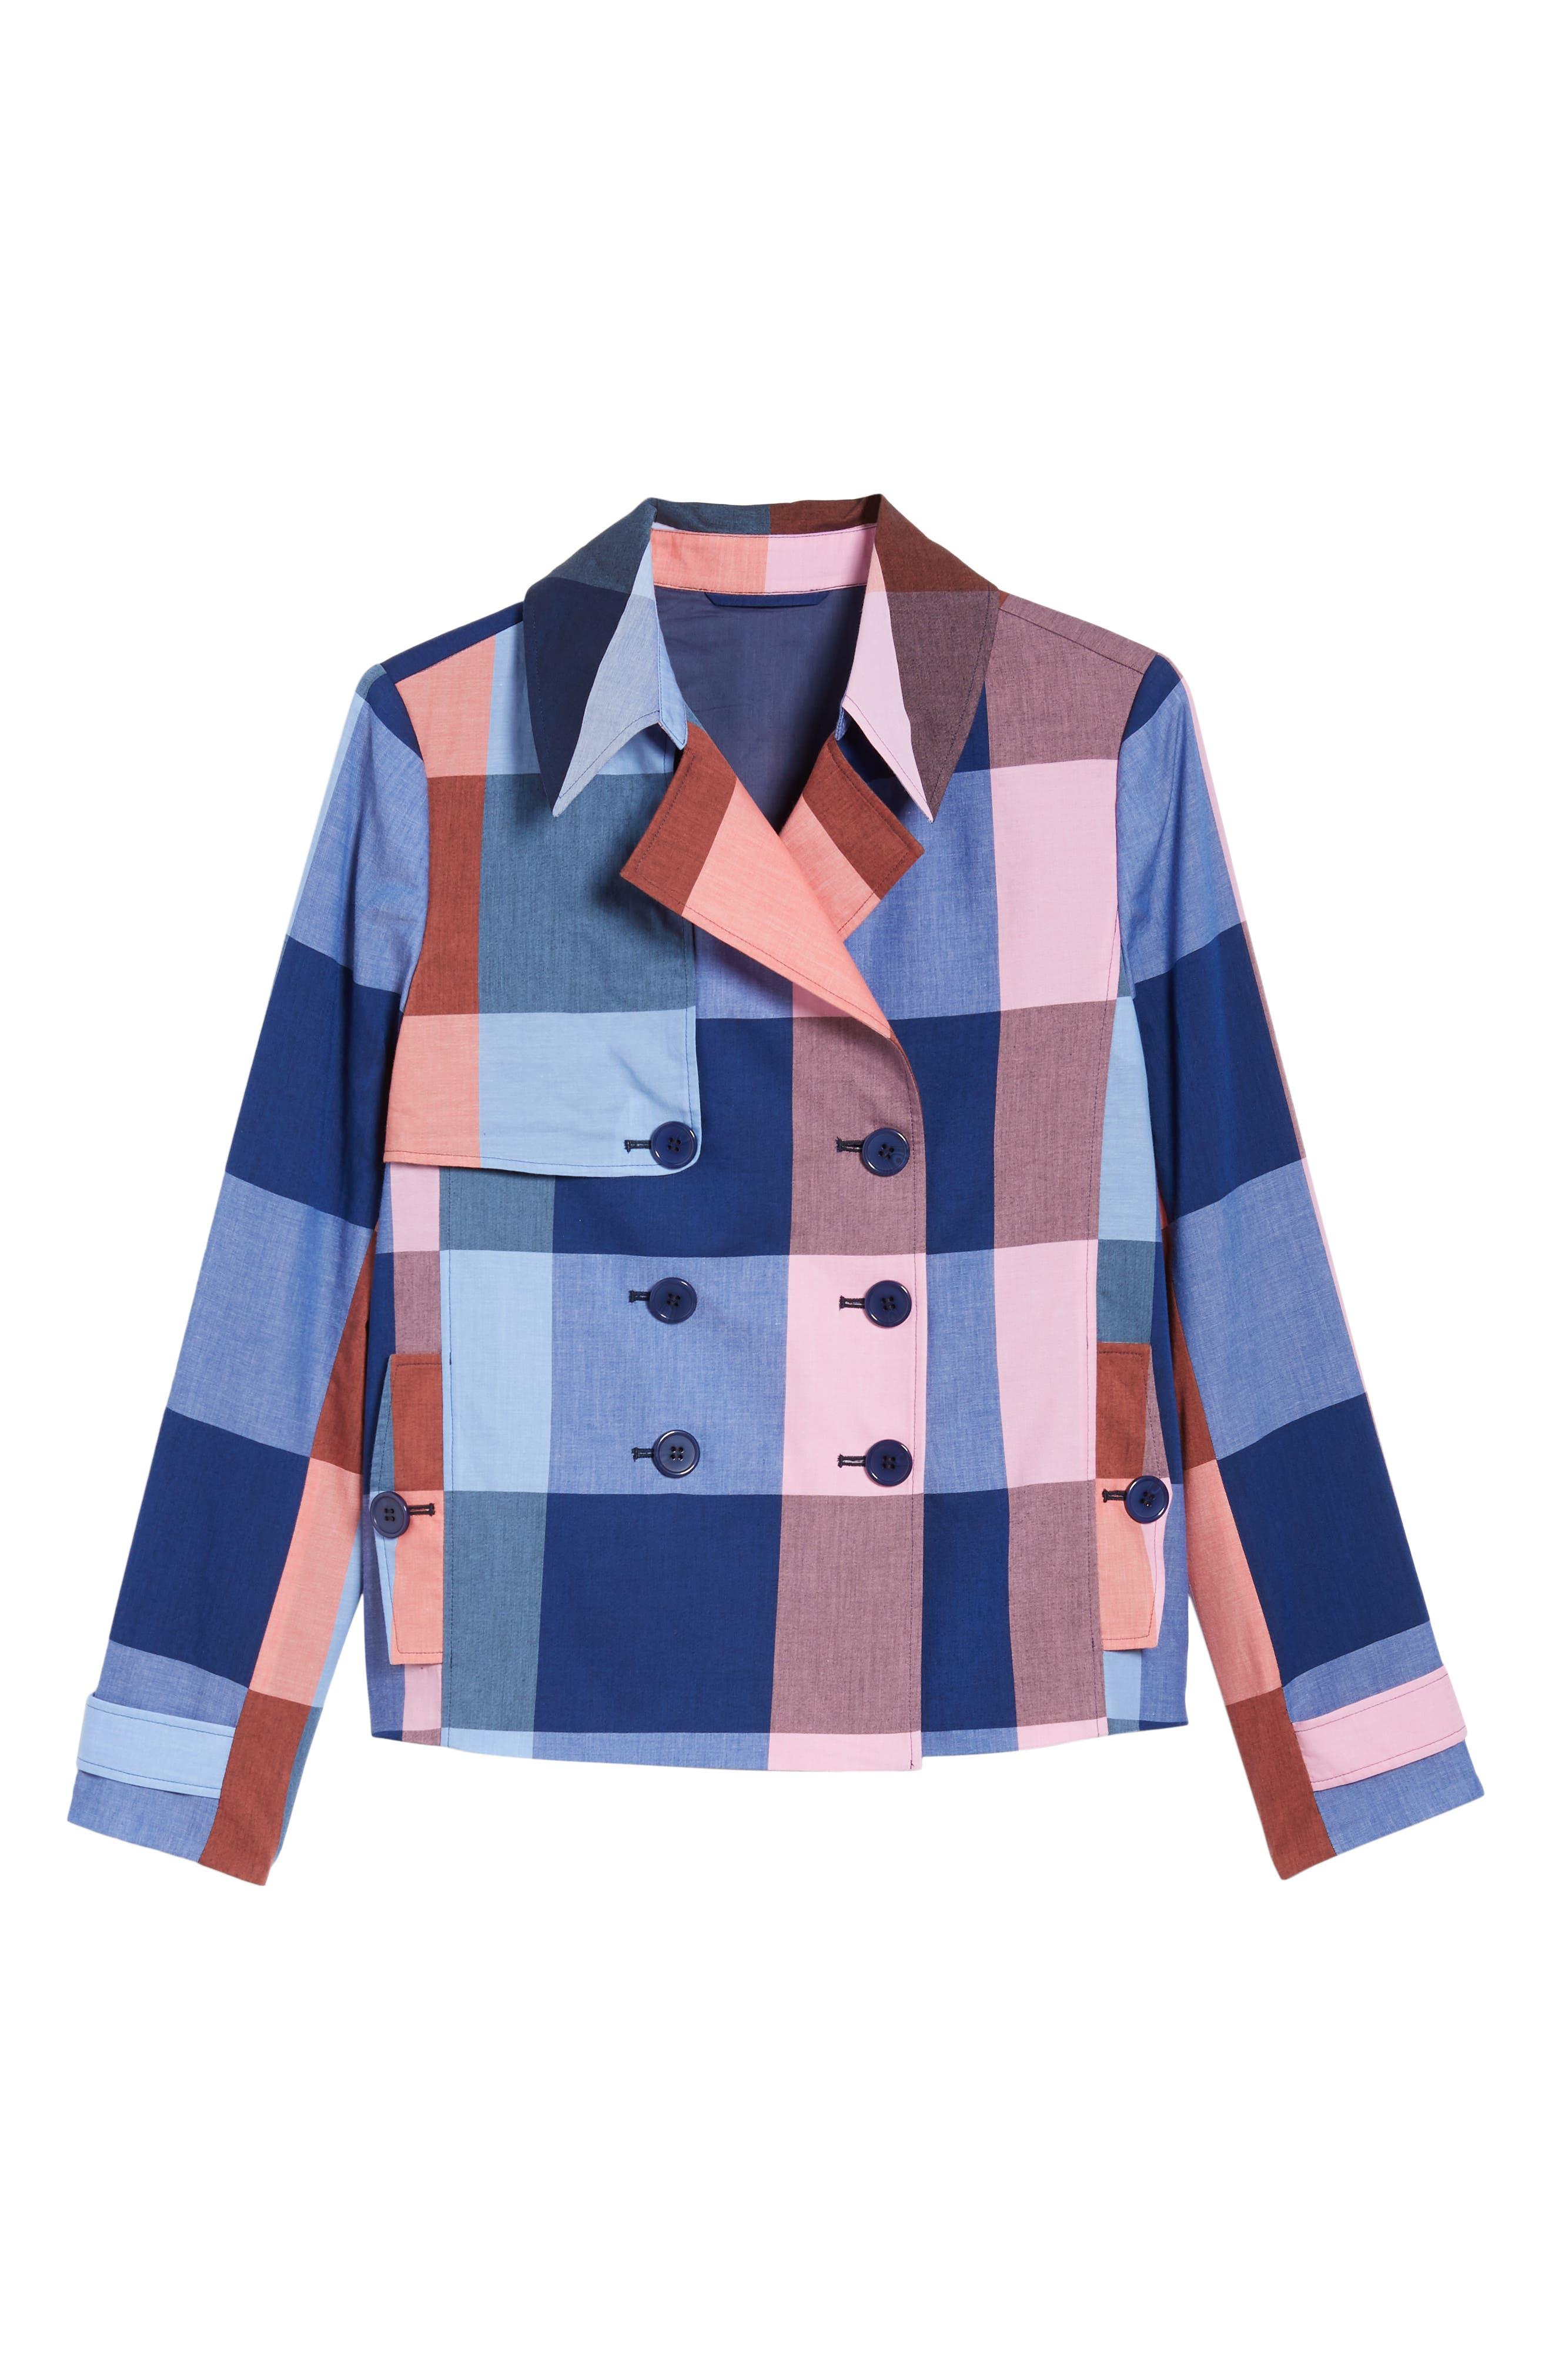 Double Breasted Plaid Cotton Blazer,                             Alternate thumbnail 7, color,                             Pink- Blue Plaid